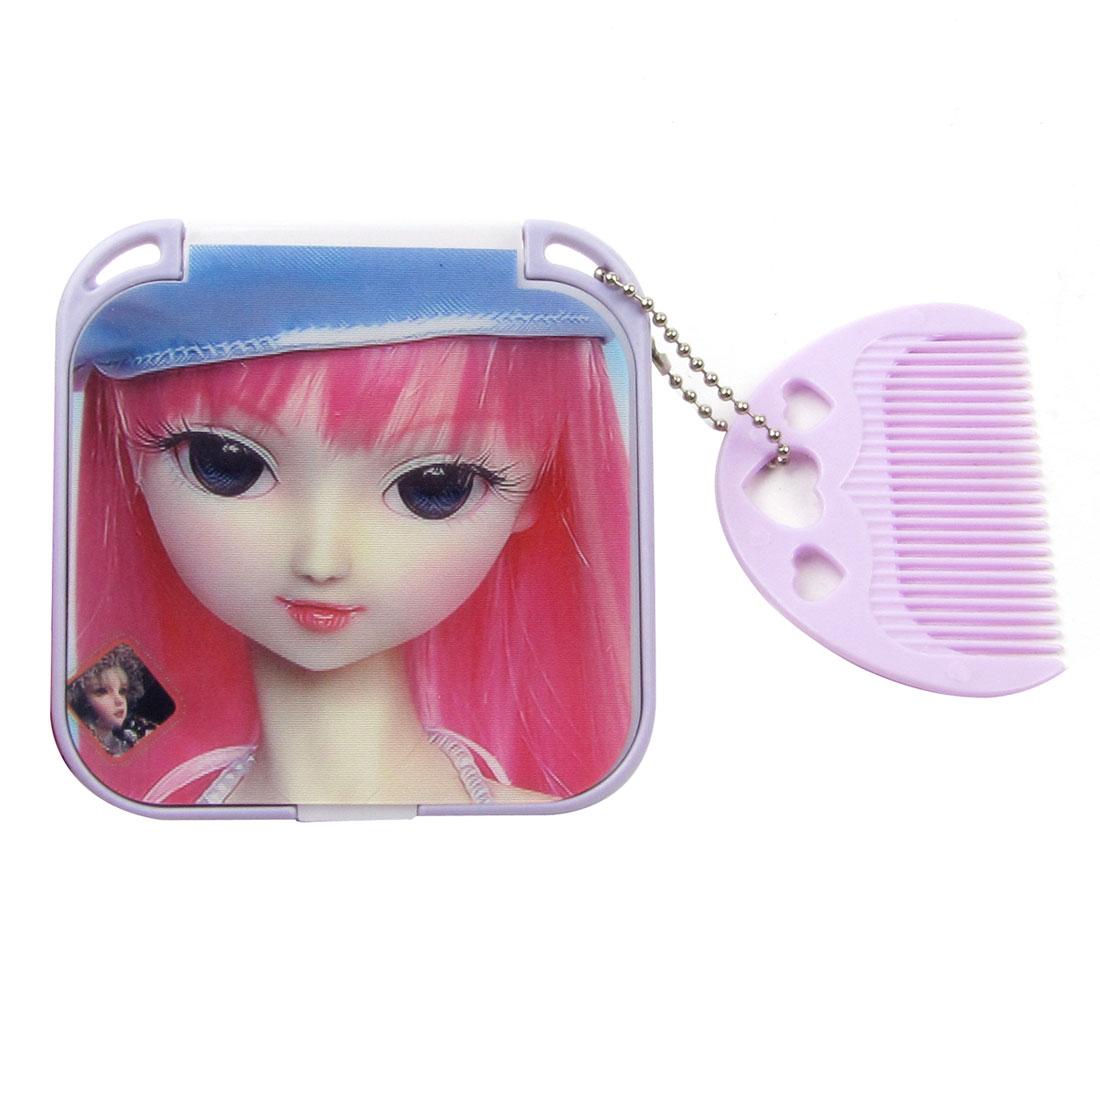 Ladies Cartoon Cover Make Up Pocket Square Design Mirror w Light Purple Comb